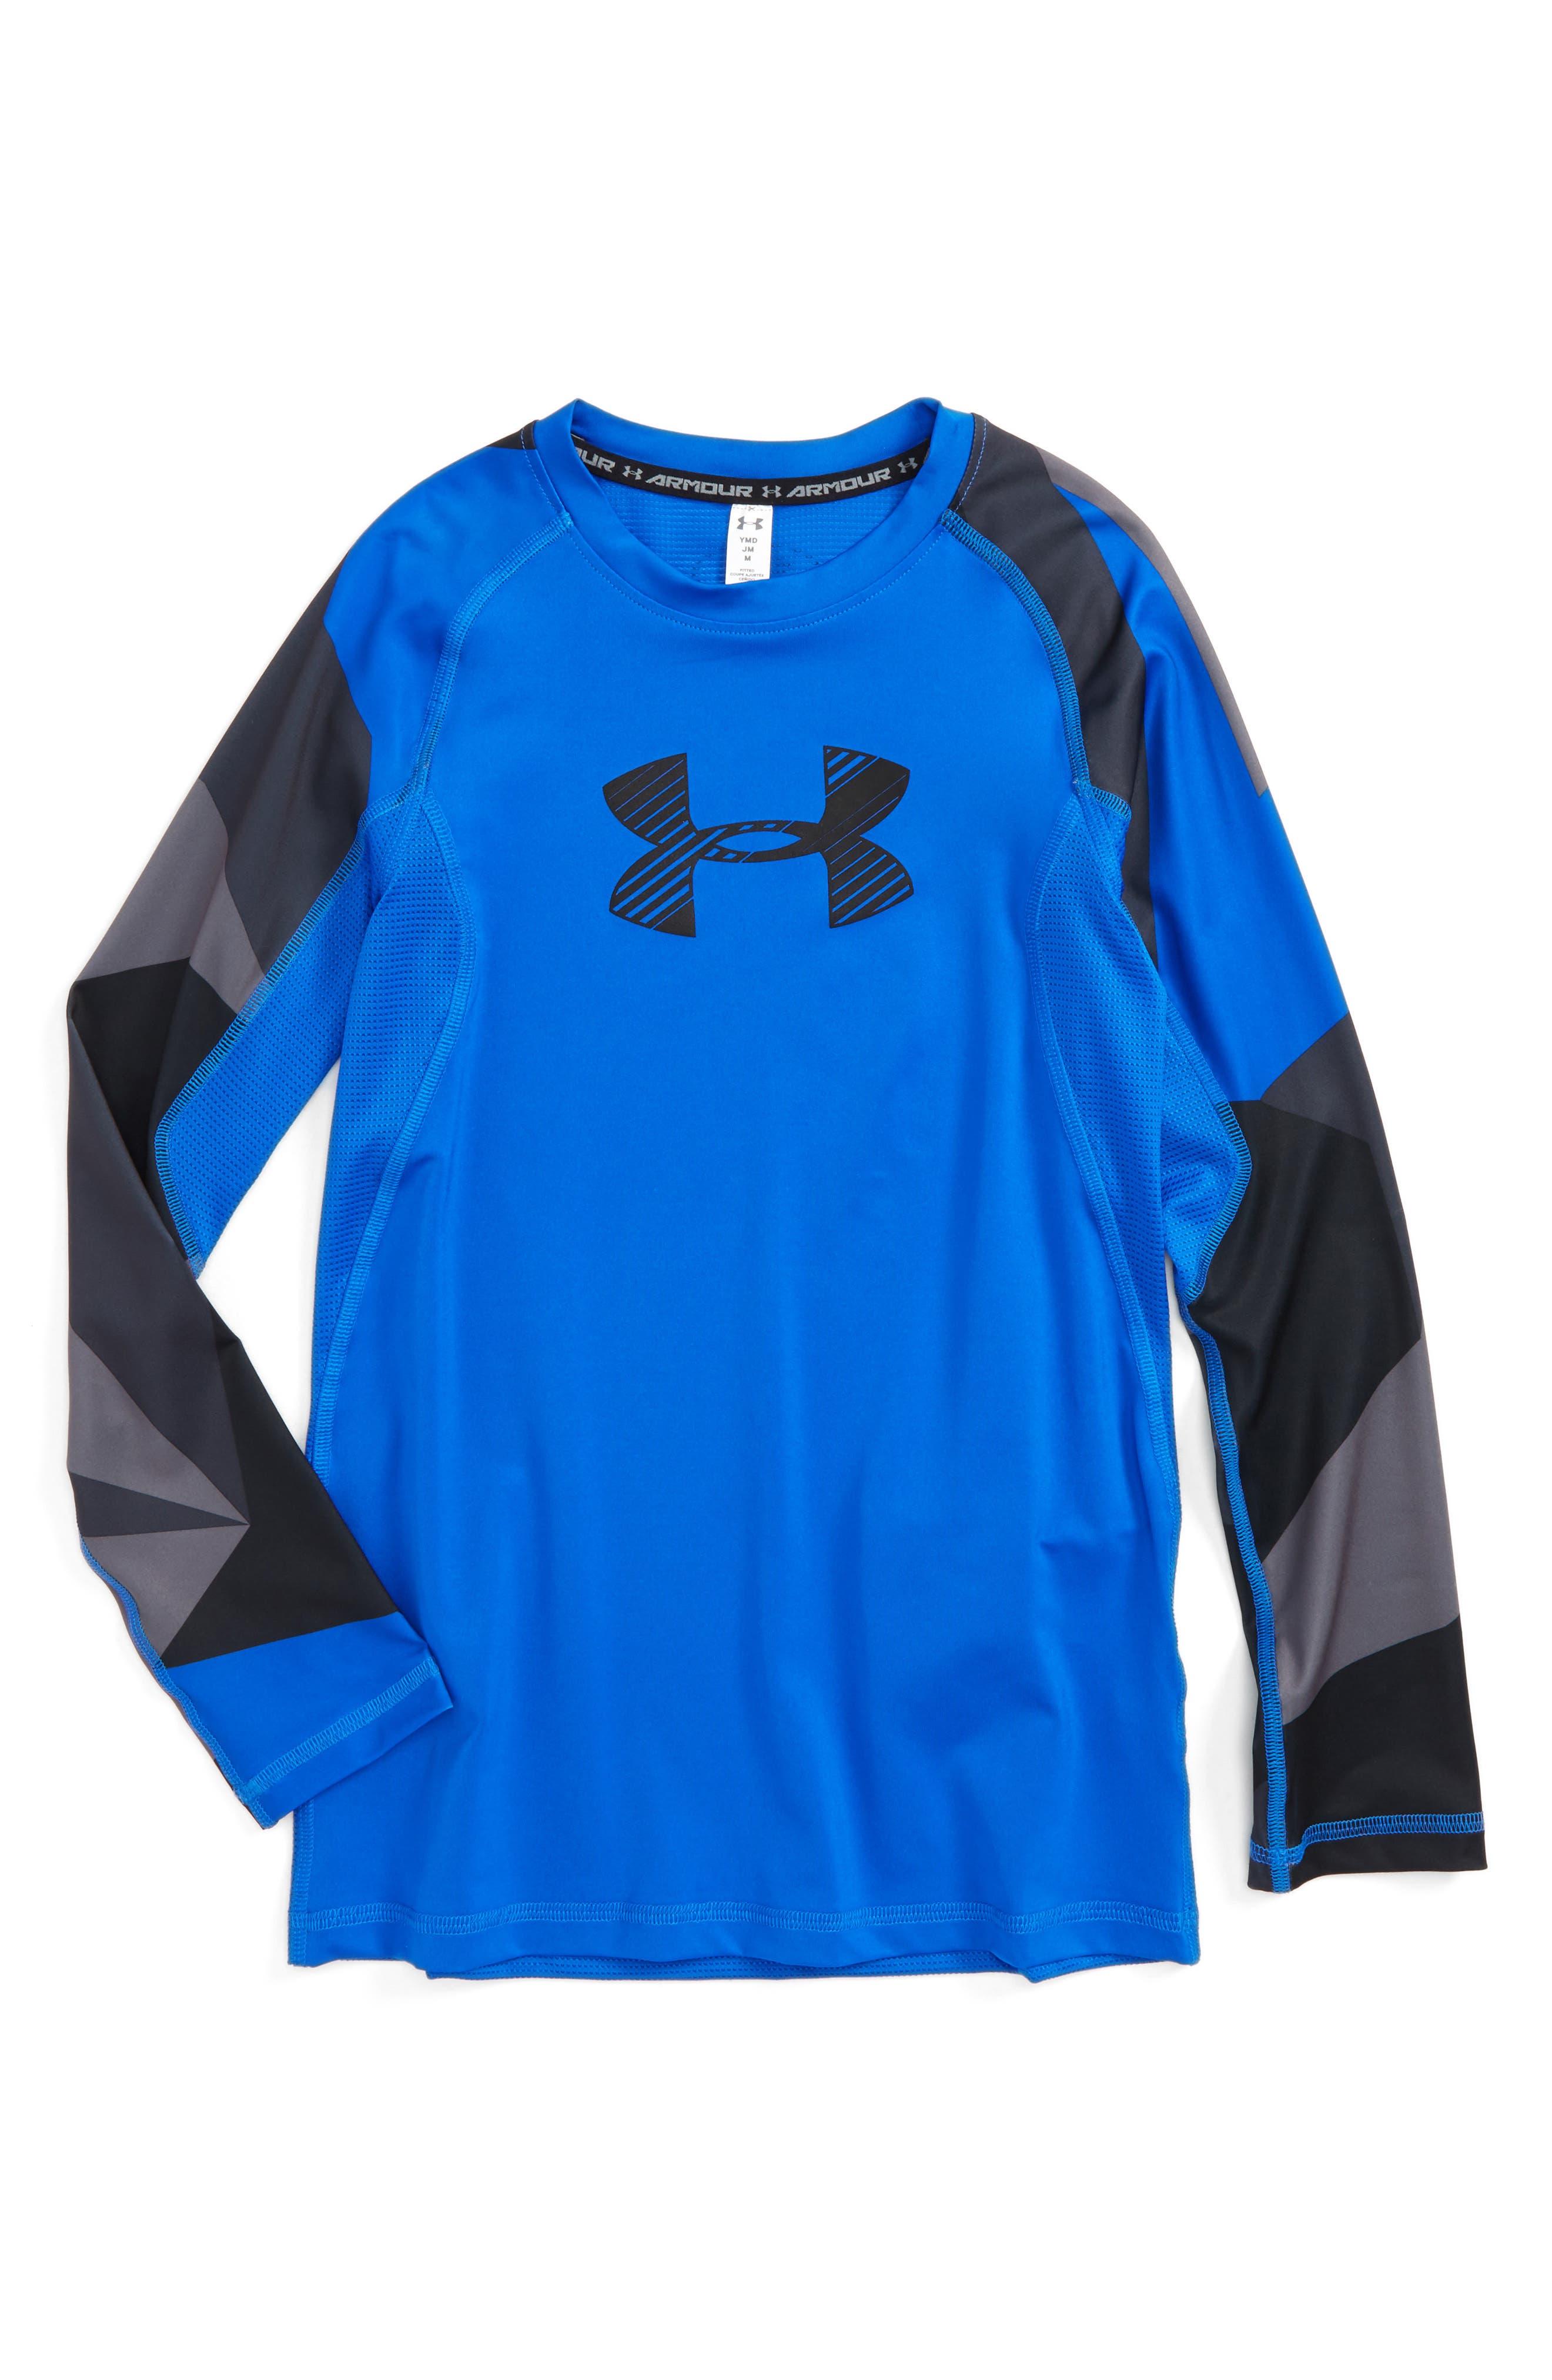 Alternate Image 1 Selected - Under Armour Novelty HeatGear® Shirt (Little Boys & Big Boys)